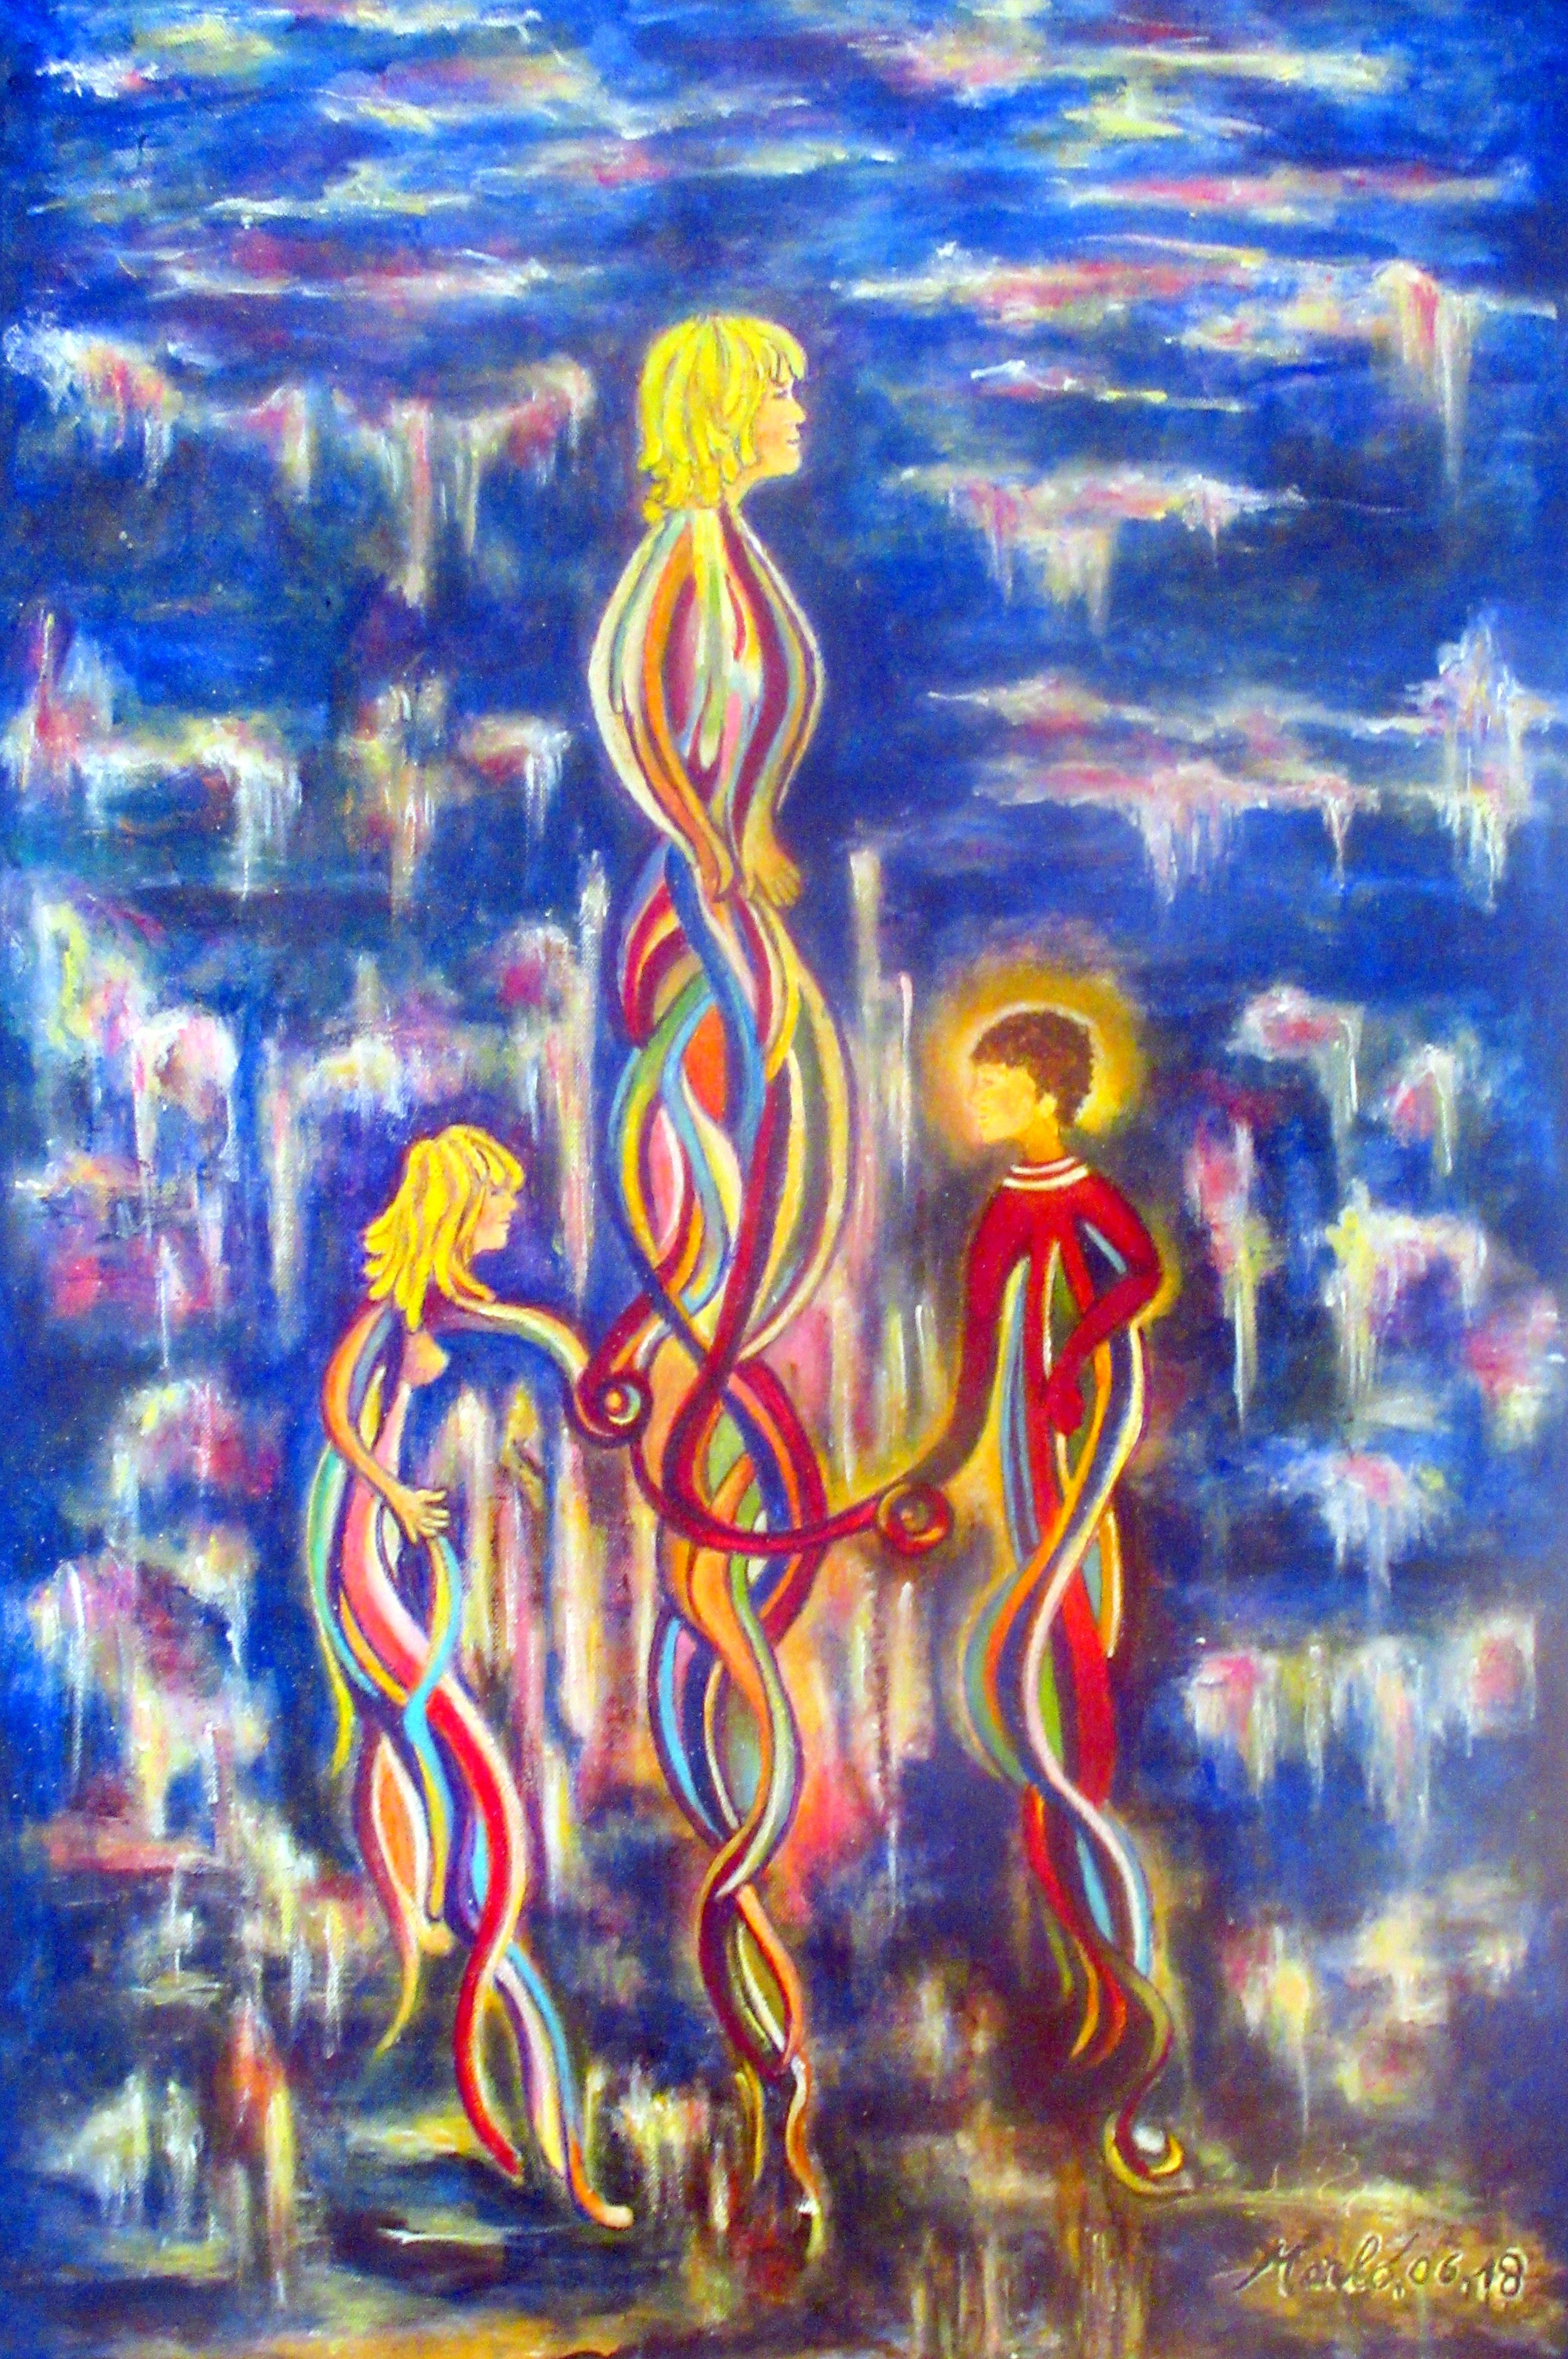 La maman. Arylic on canvas. 90 cm H x 60 cm W. 2018